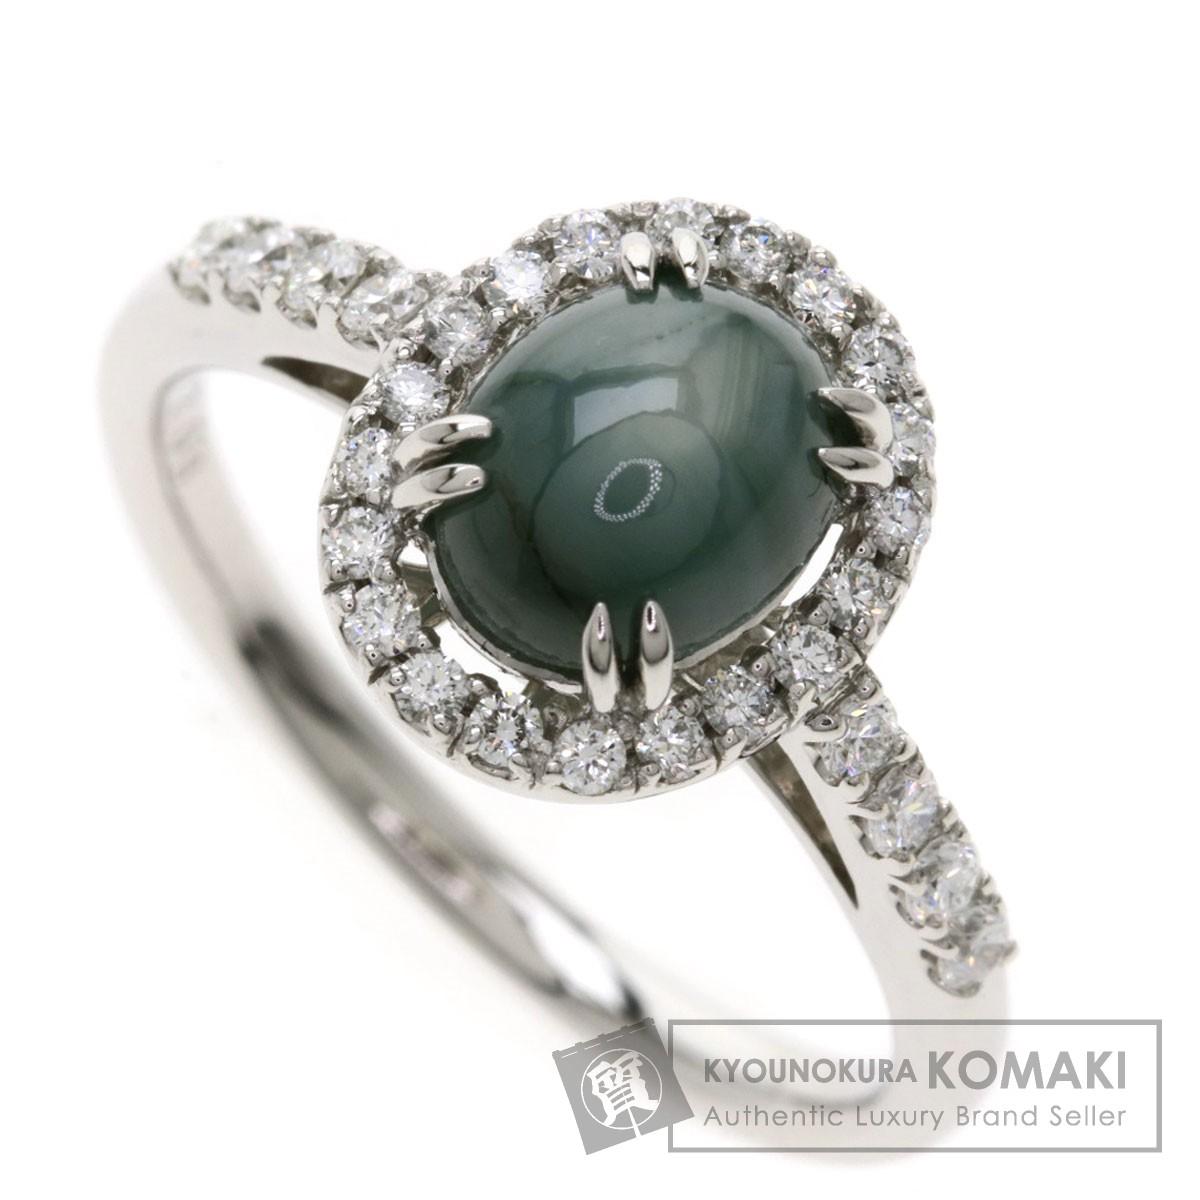 2.08ct スターサファイア ダイヤモンド リング・指輪 プラチナPT900 5.1g レディース 【中古】